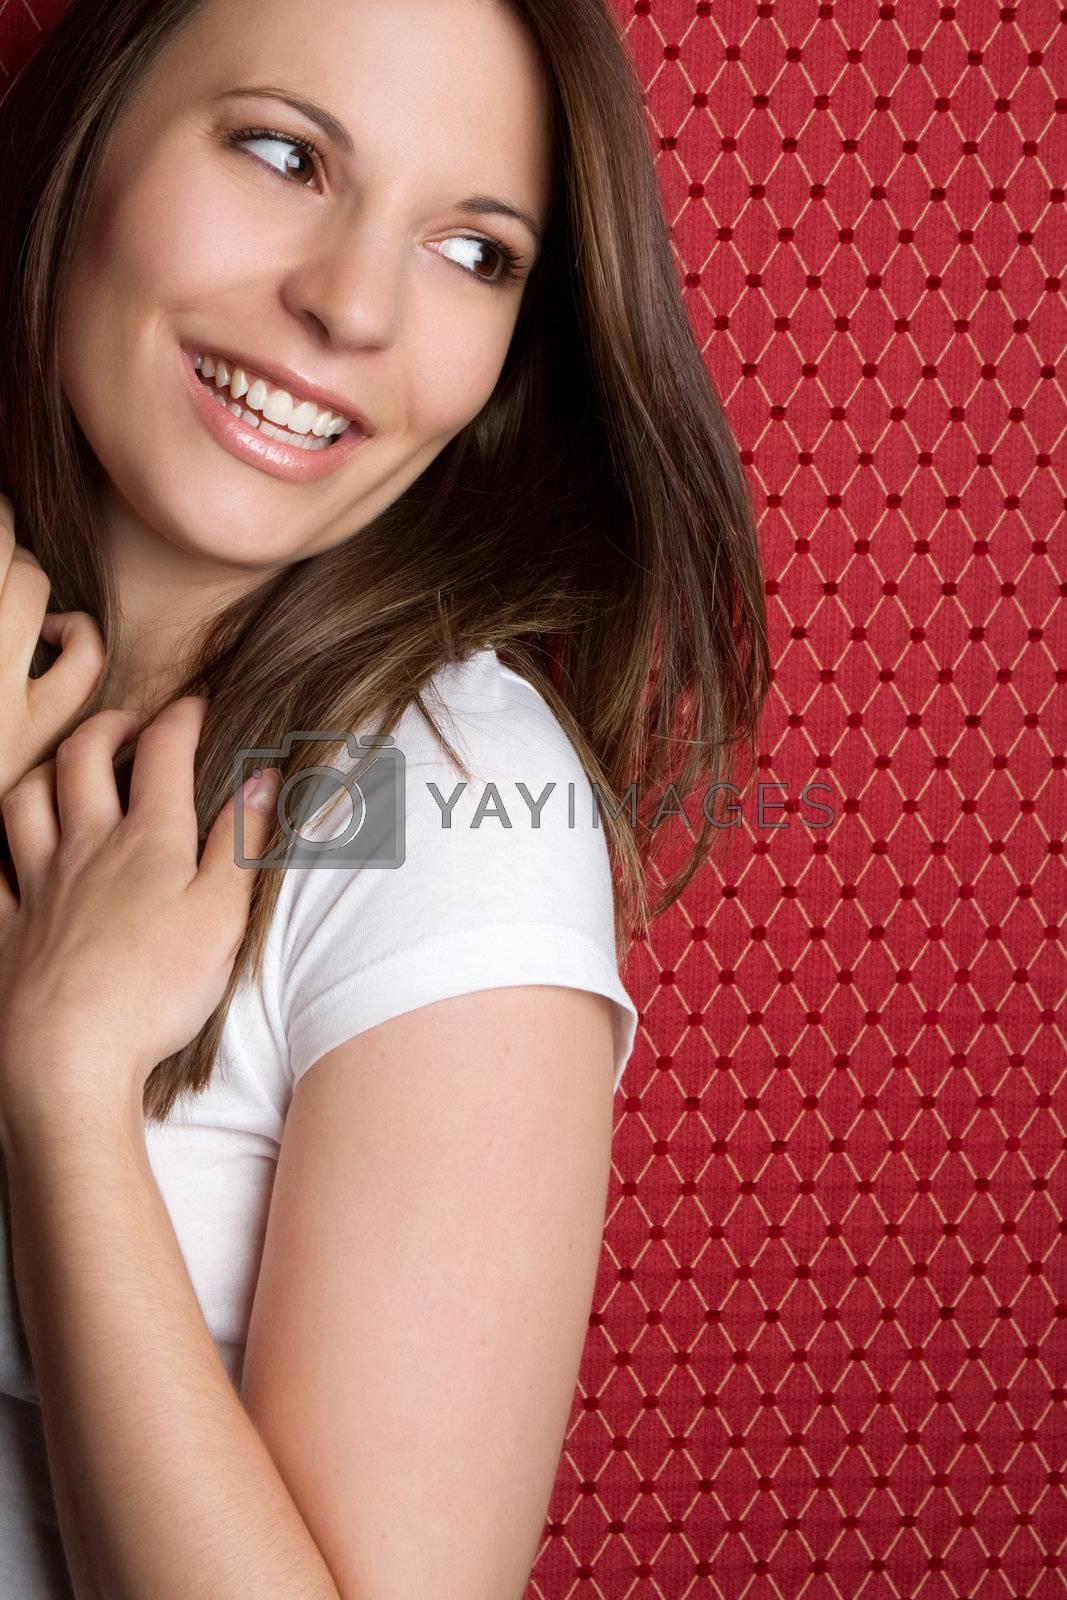 Pretty laughing teen girl